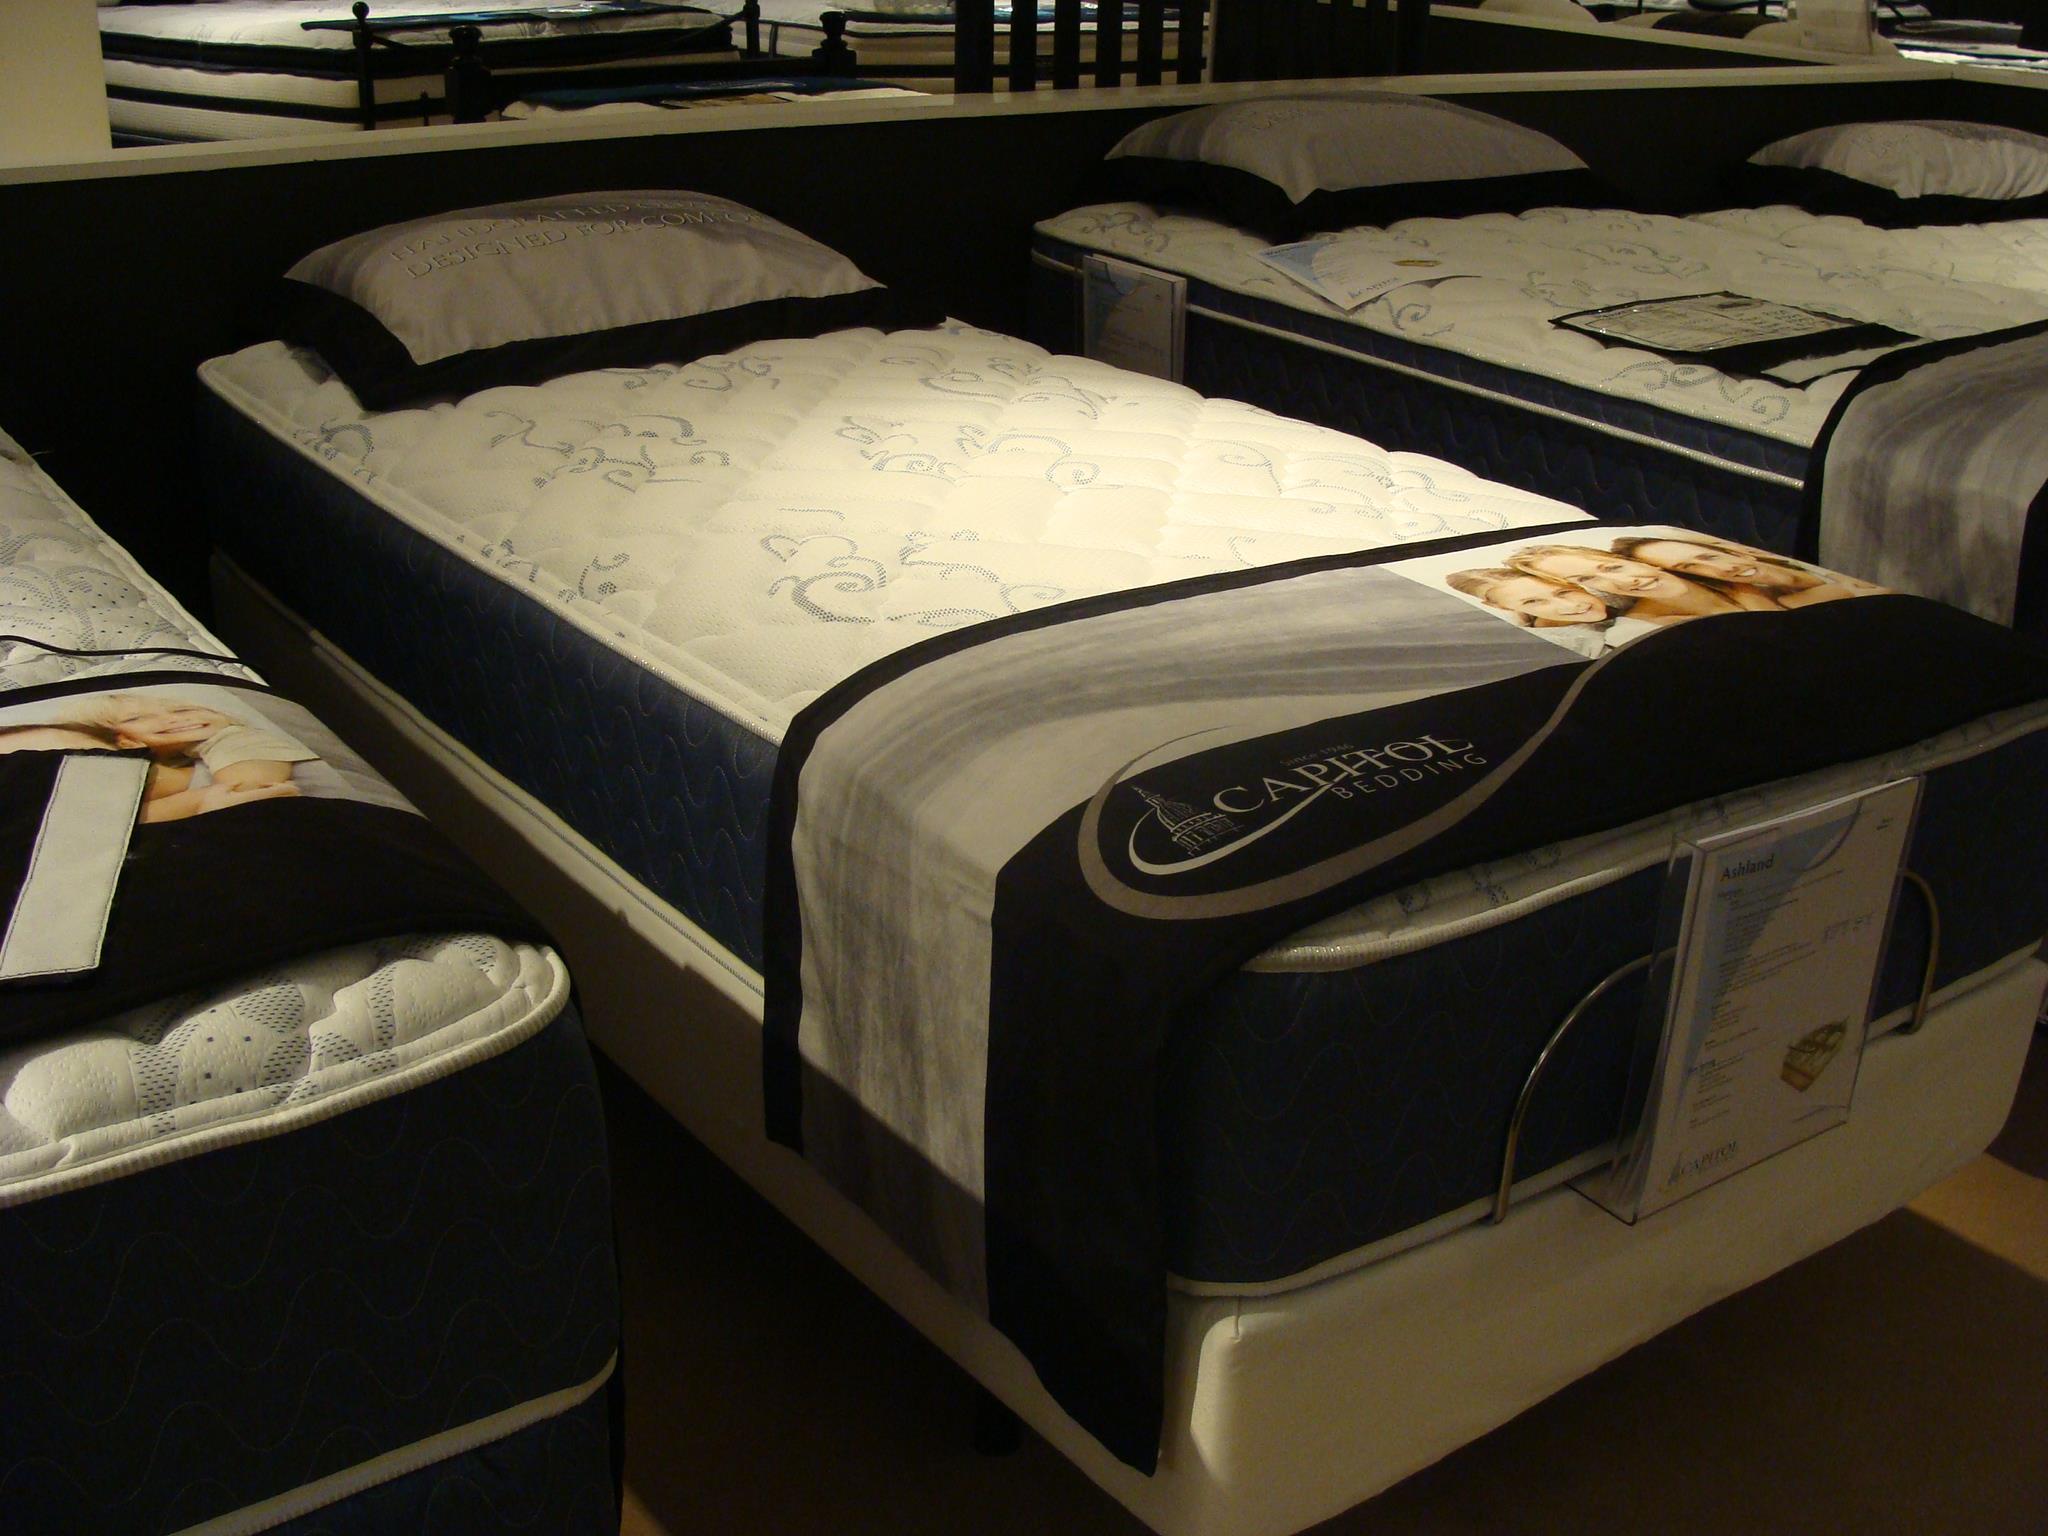 Capitol Bedding Ashland King Mattress Set - Item Number: VertiCoil-K+2xSFH-K